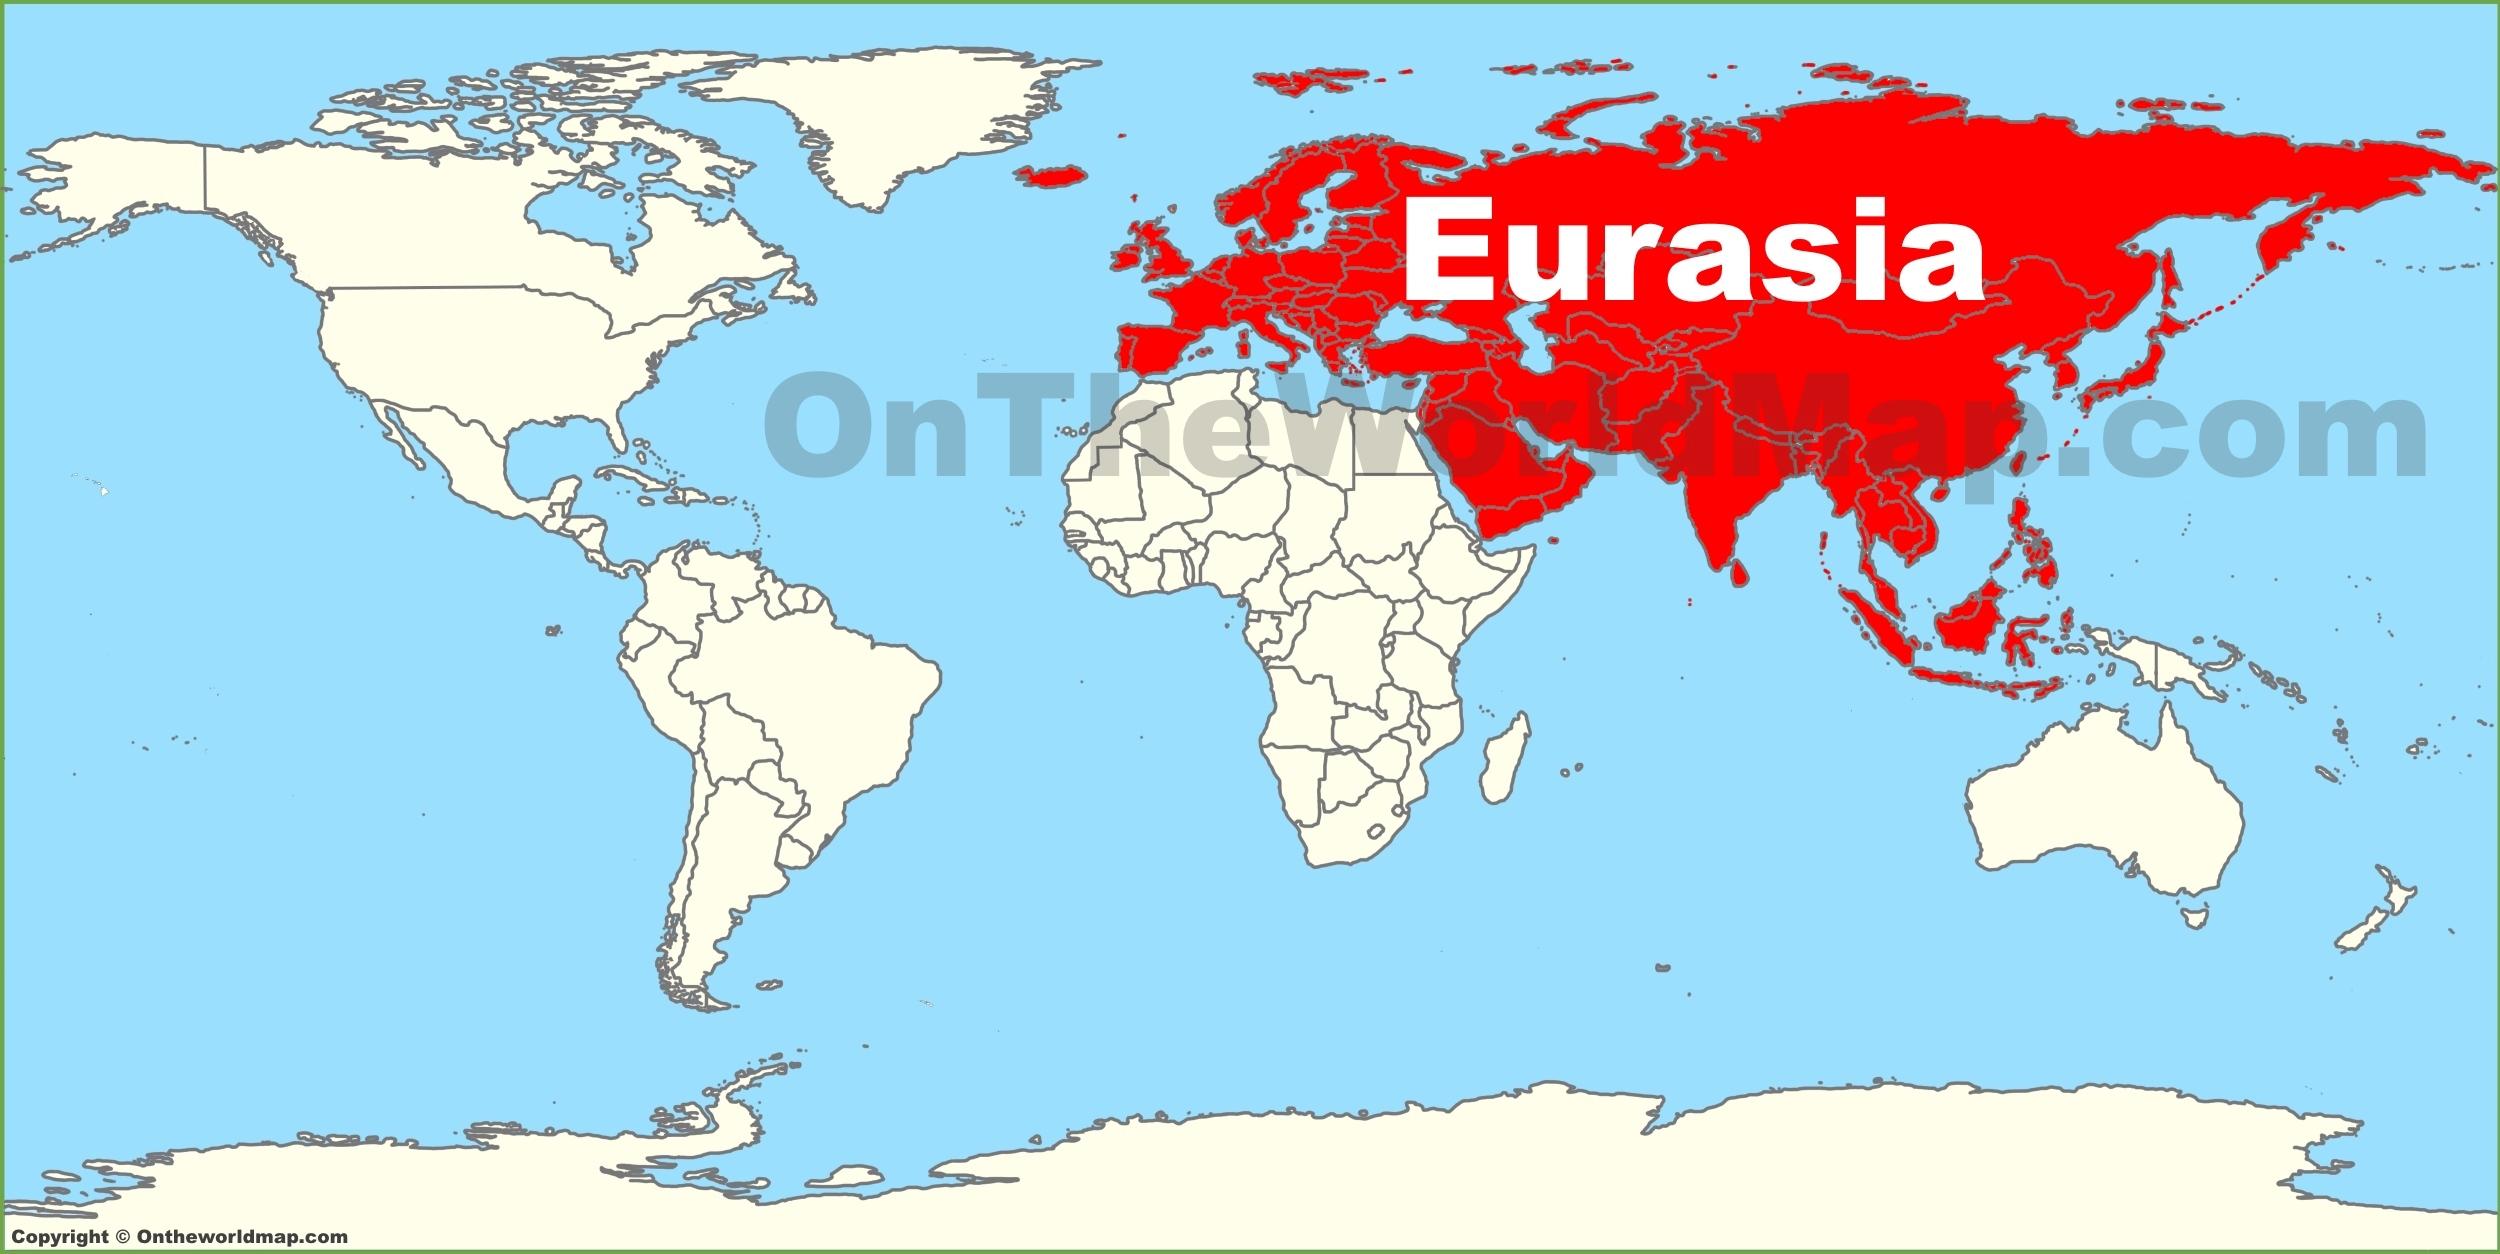 Map Of Eurasia Eurasia location on the World Map Map Of Eurasia